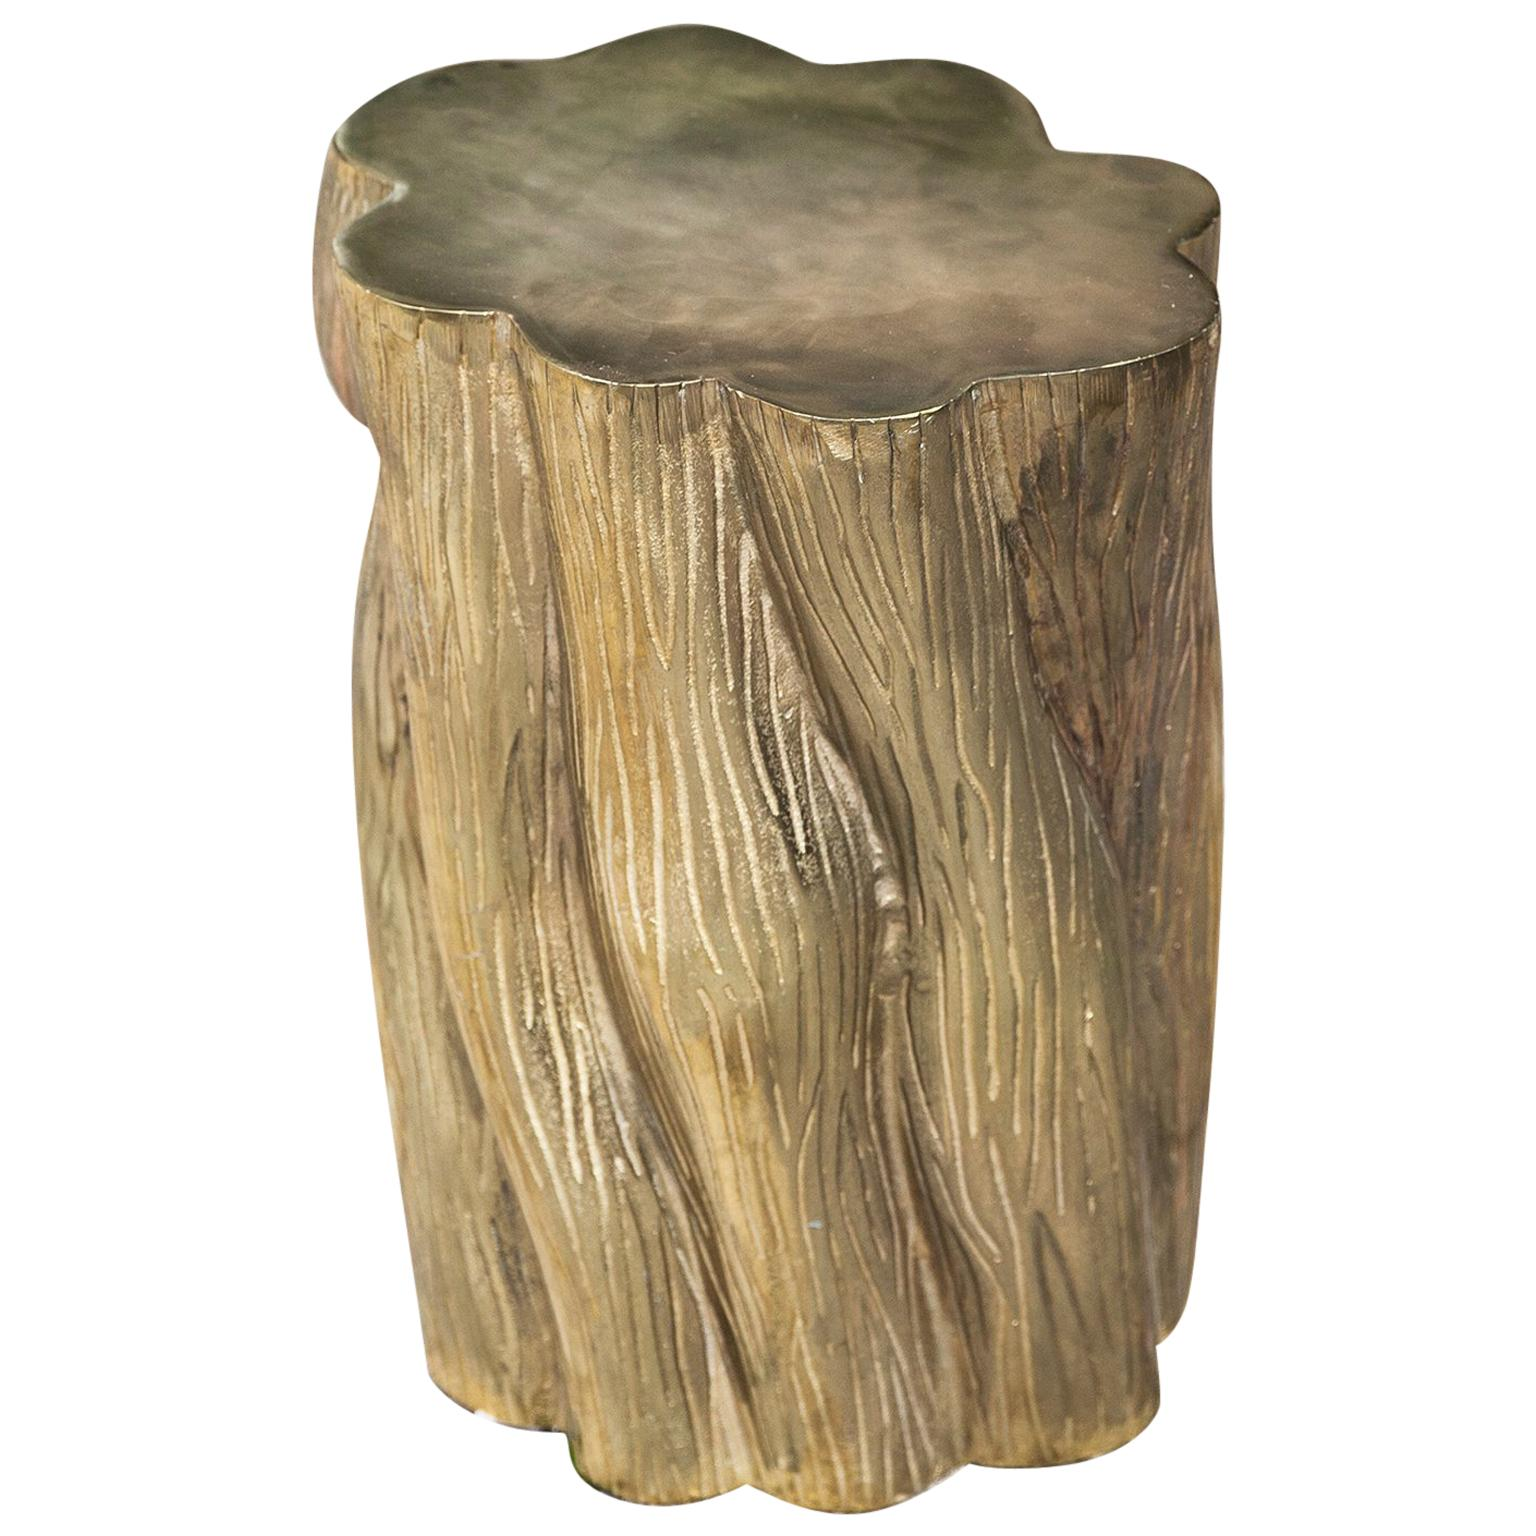 Brass Tree Stump Side Table